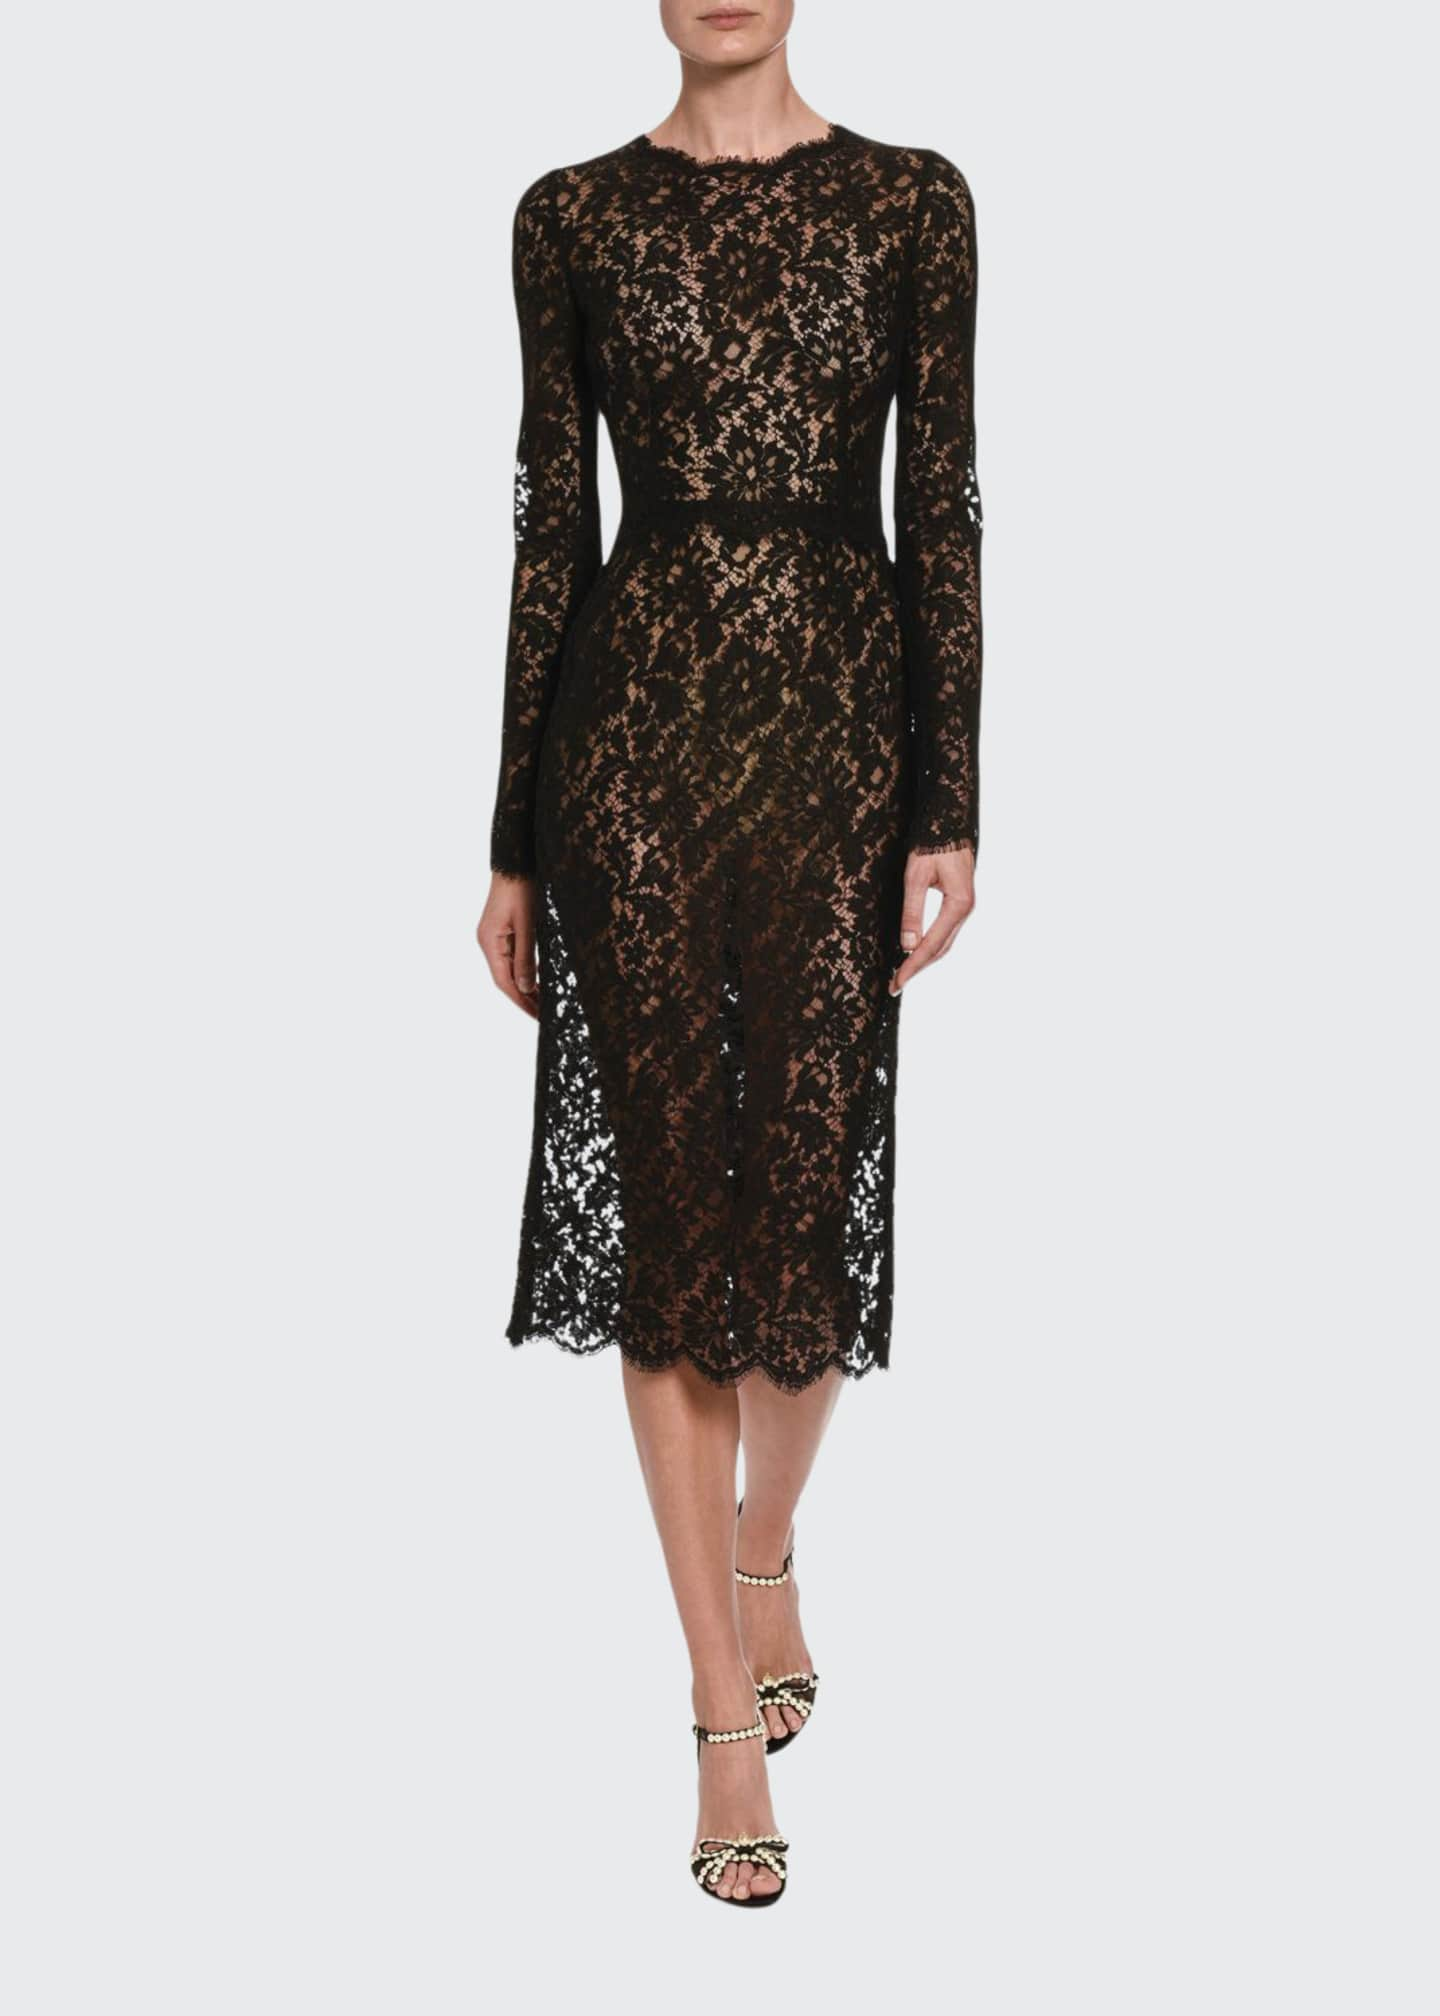 Dolce & Gabbana Classic Sheer Lace Long-Sleeve Midi